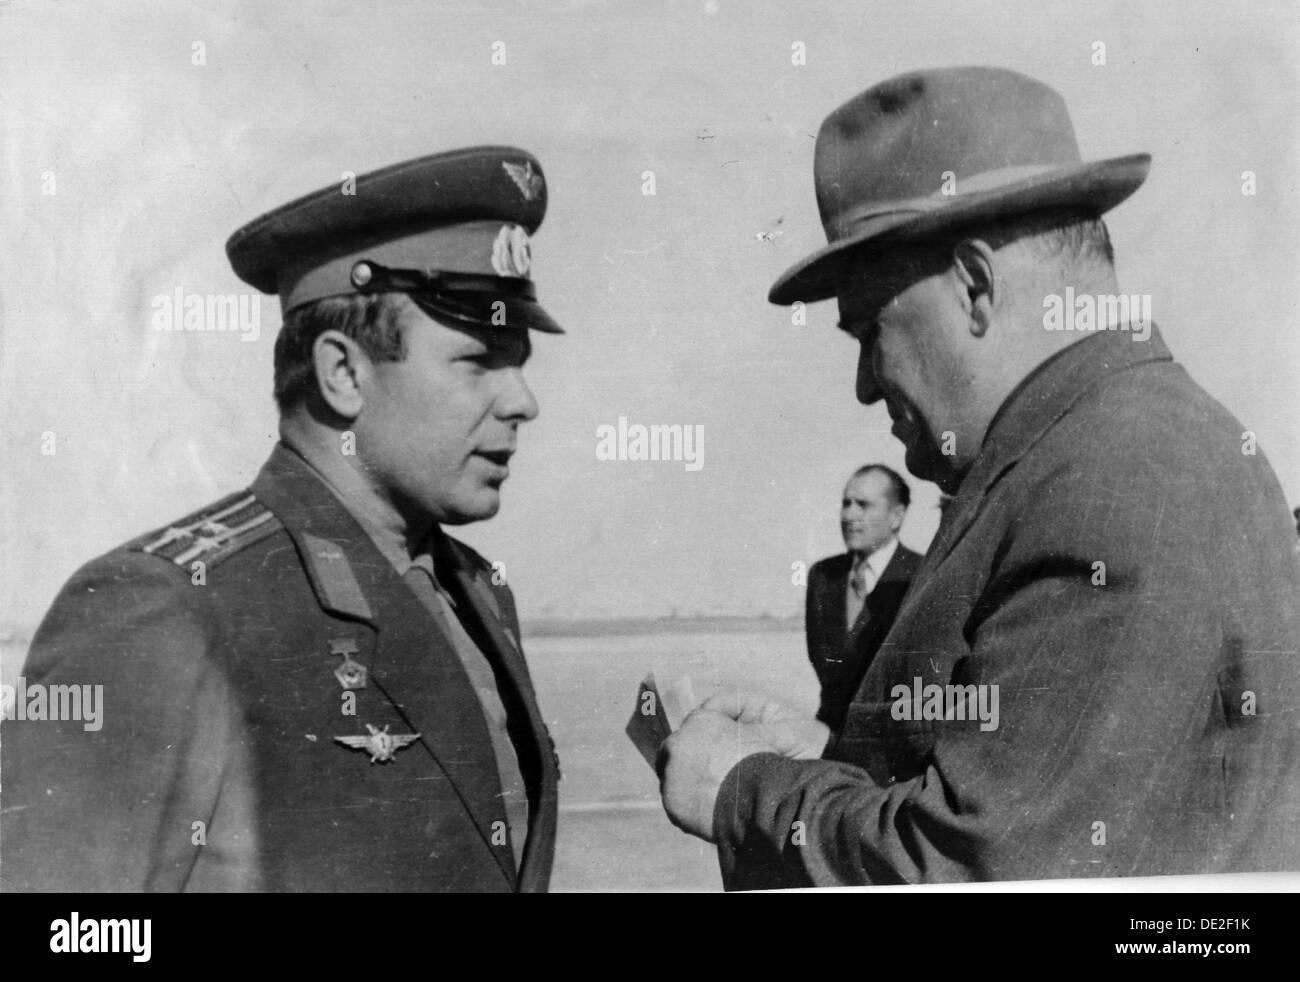 Russian cosmonaut Yuri Gagarin and rocket engineer Sergey Korolyov, 1961. - Stock Image